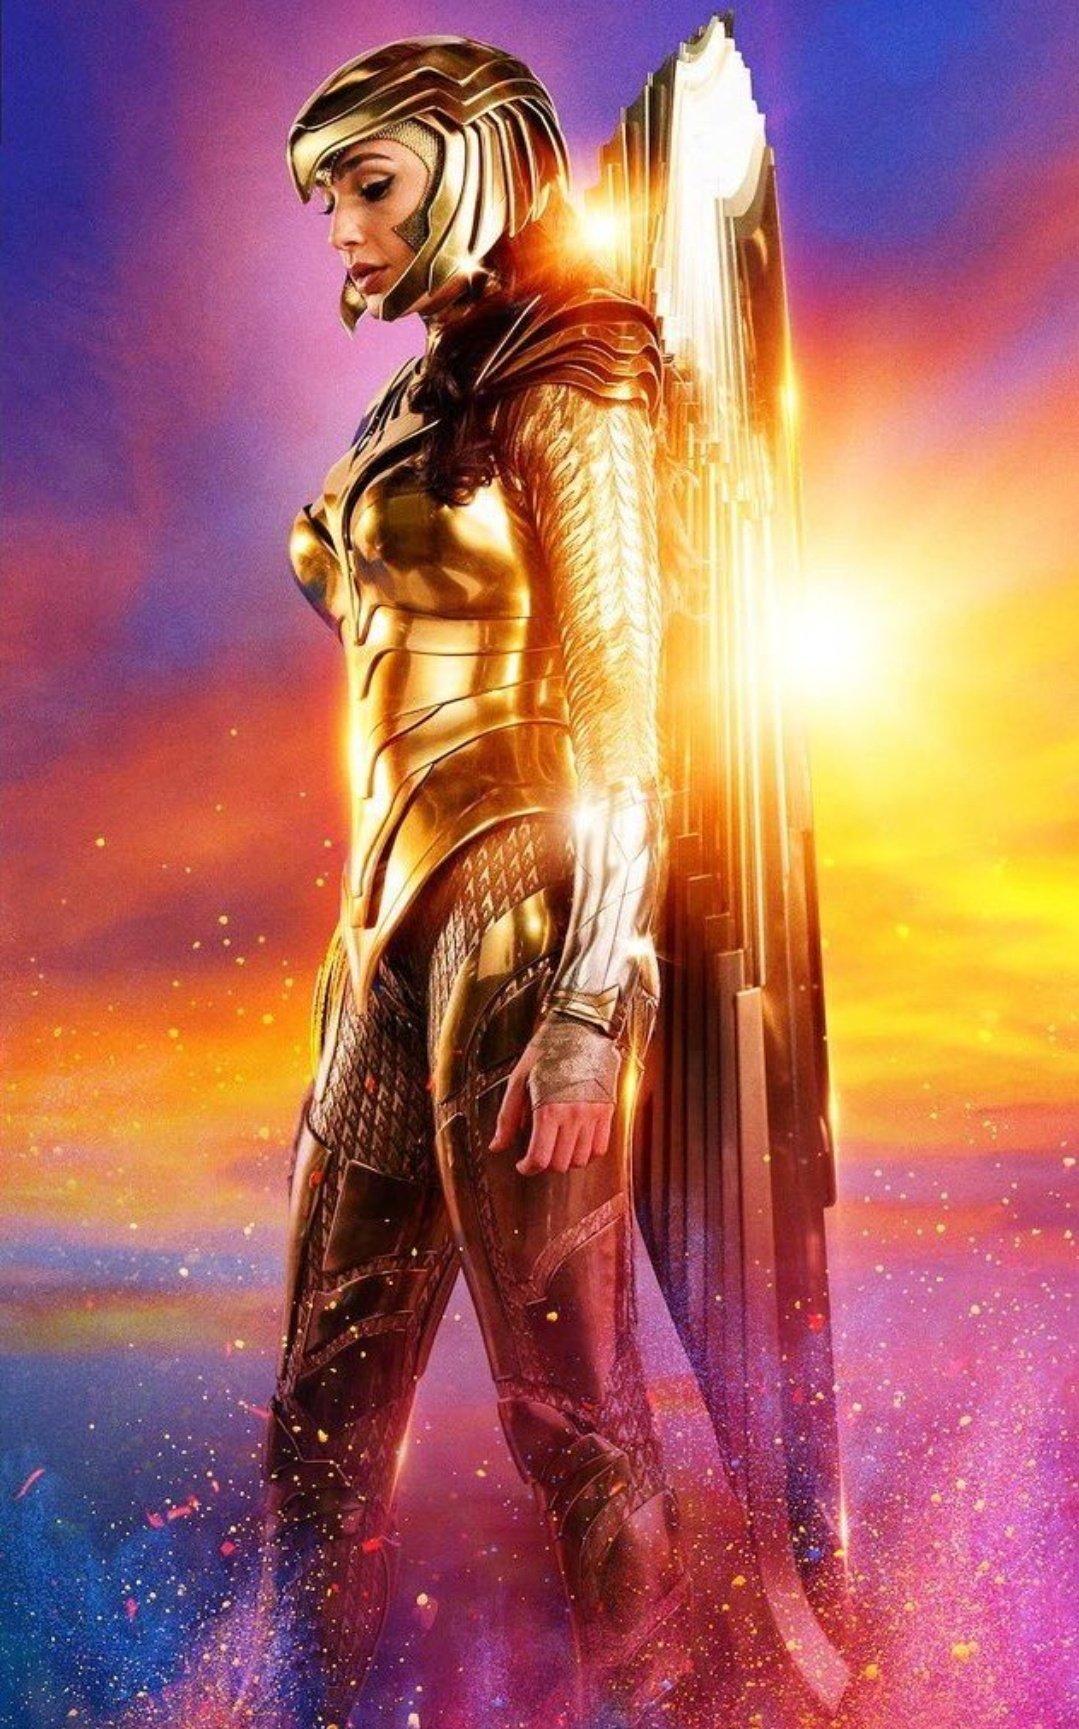 Wonder Woman 1984 Start & Poster 2